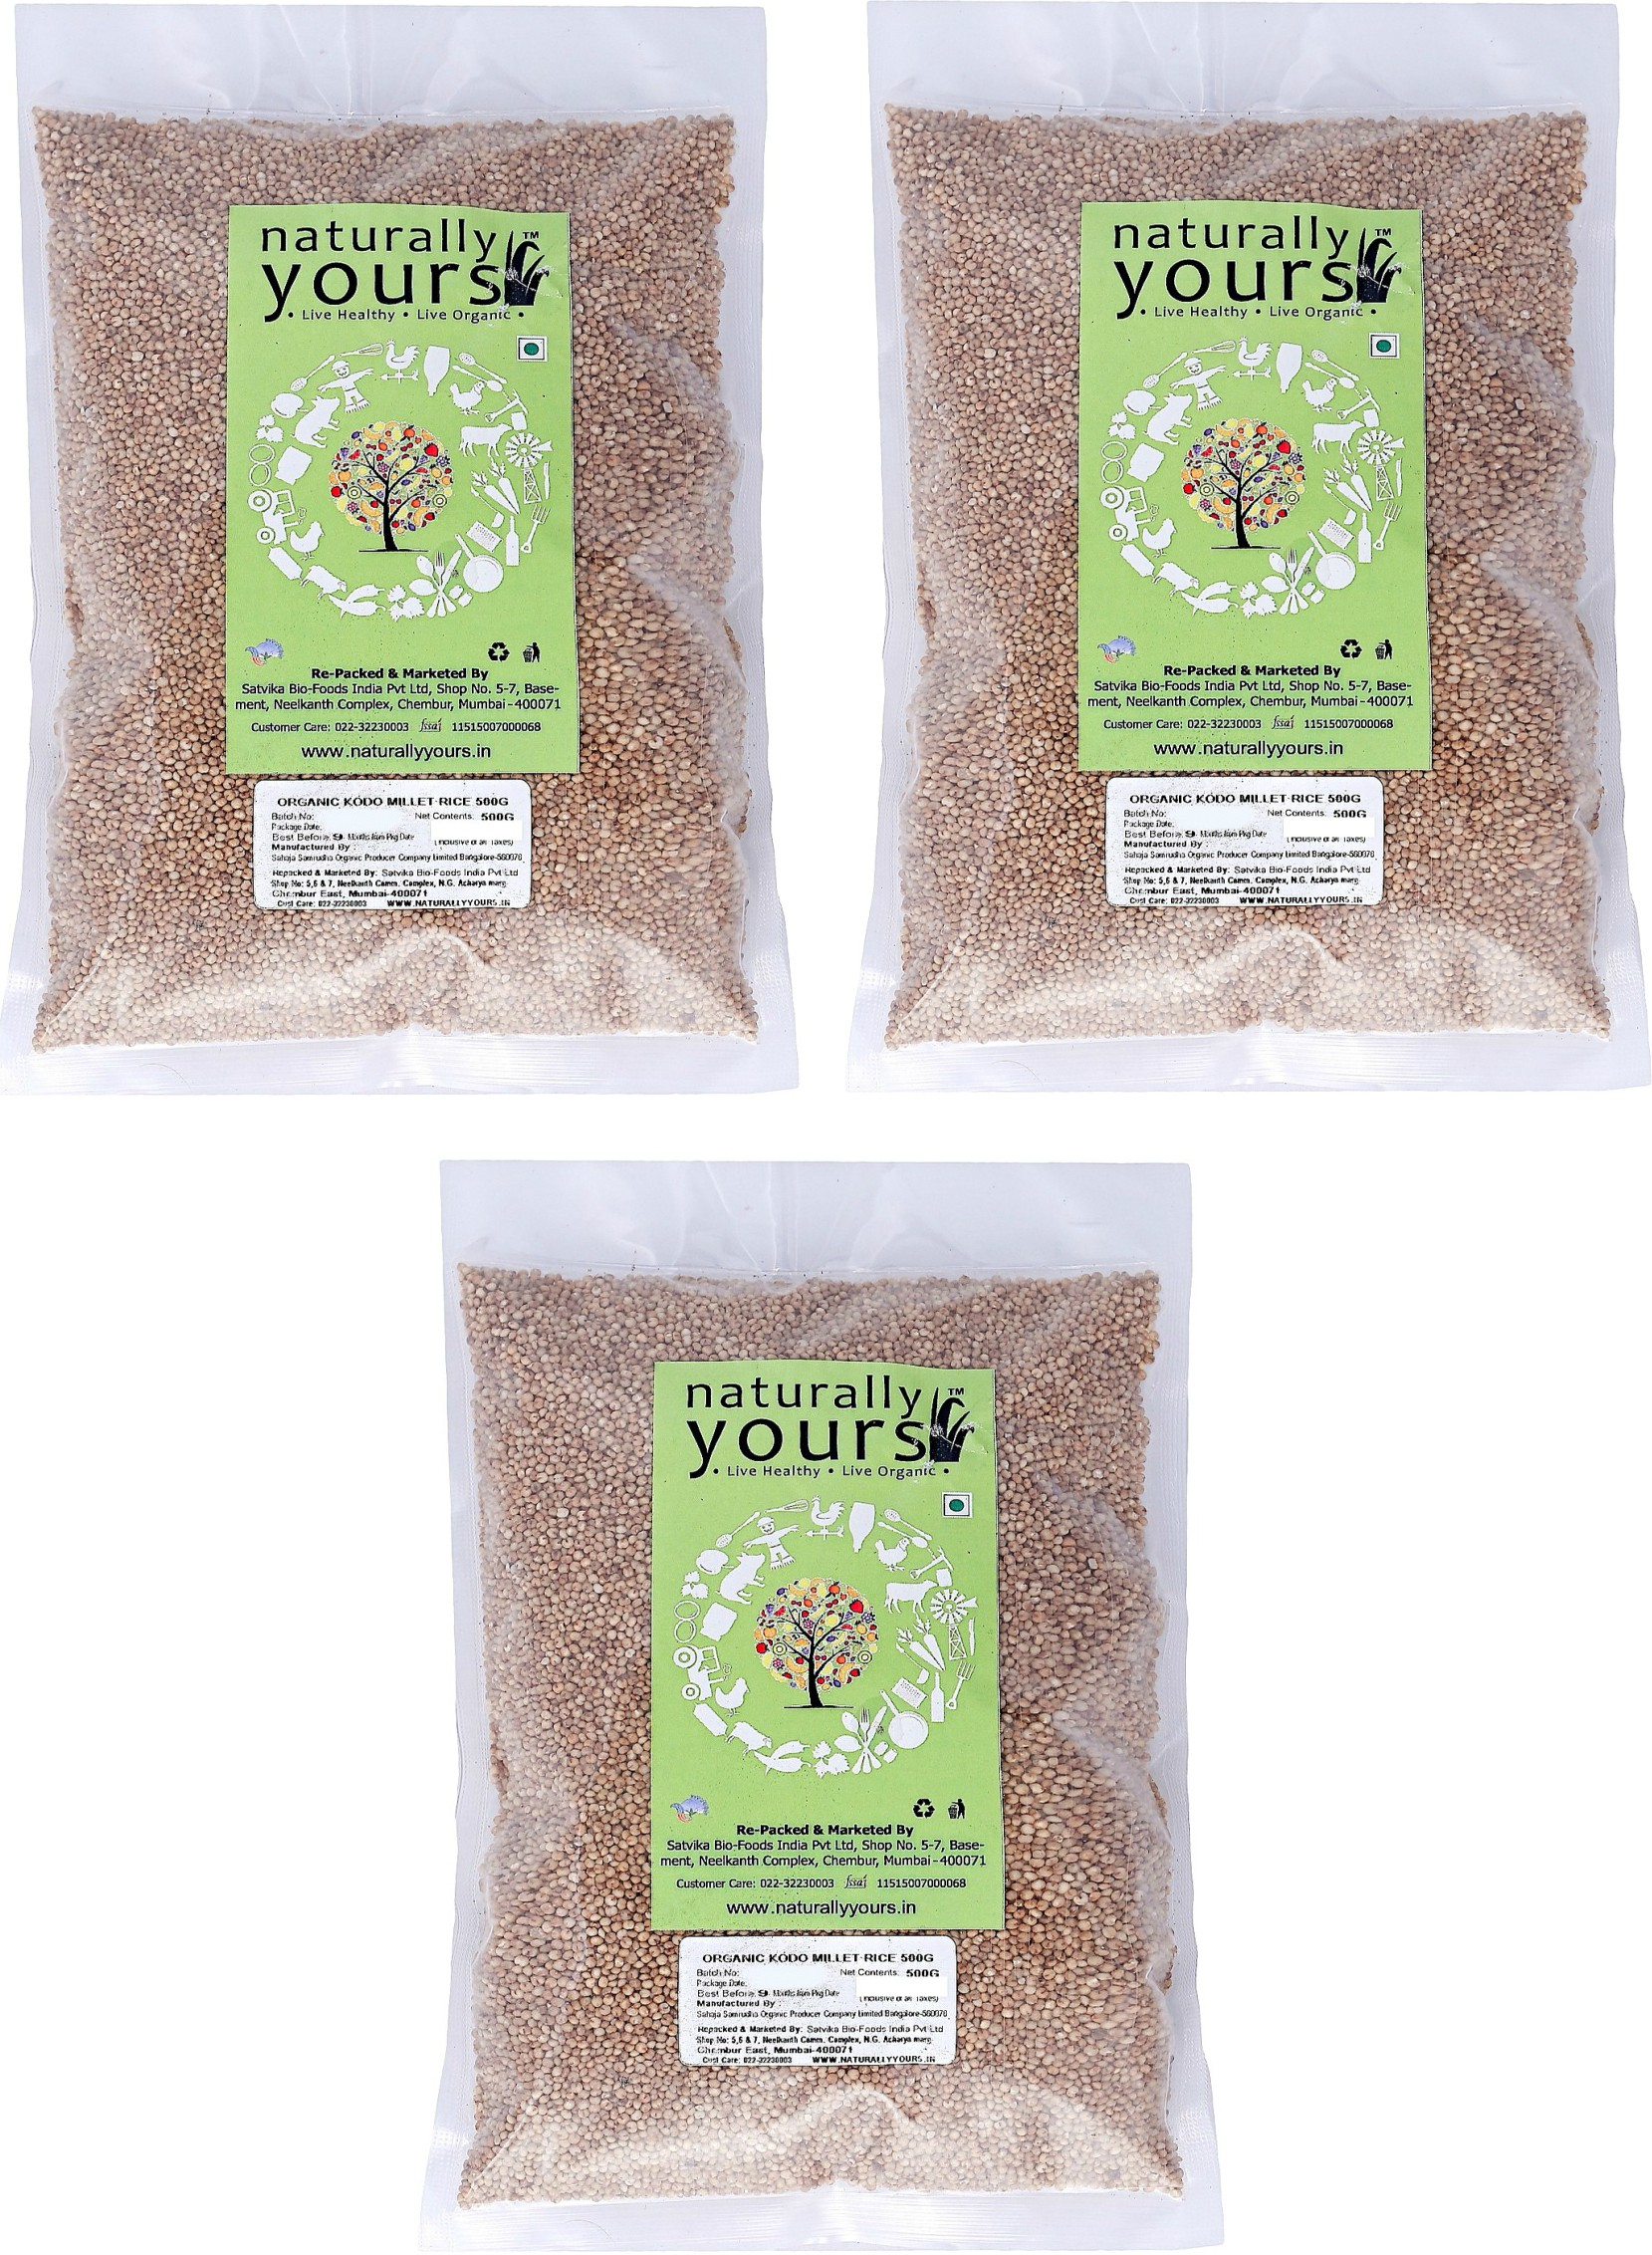 Naturally Yours Organic Certified Kodo millet